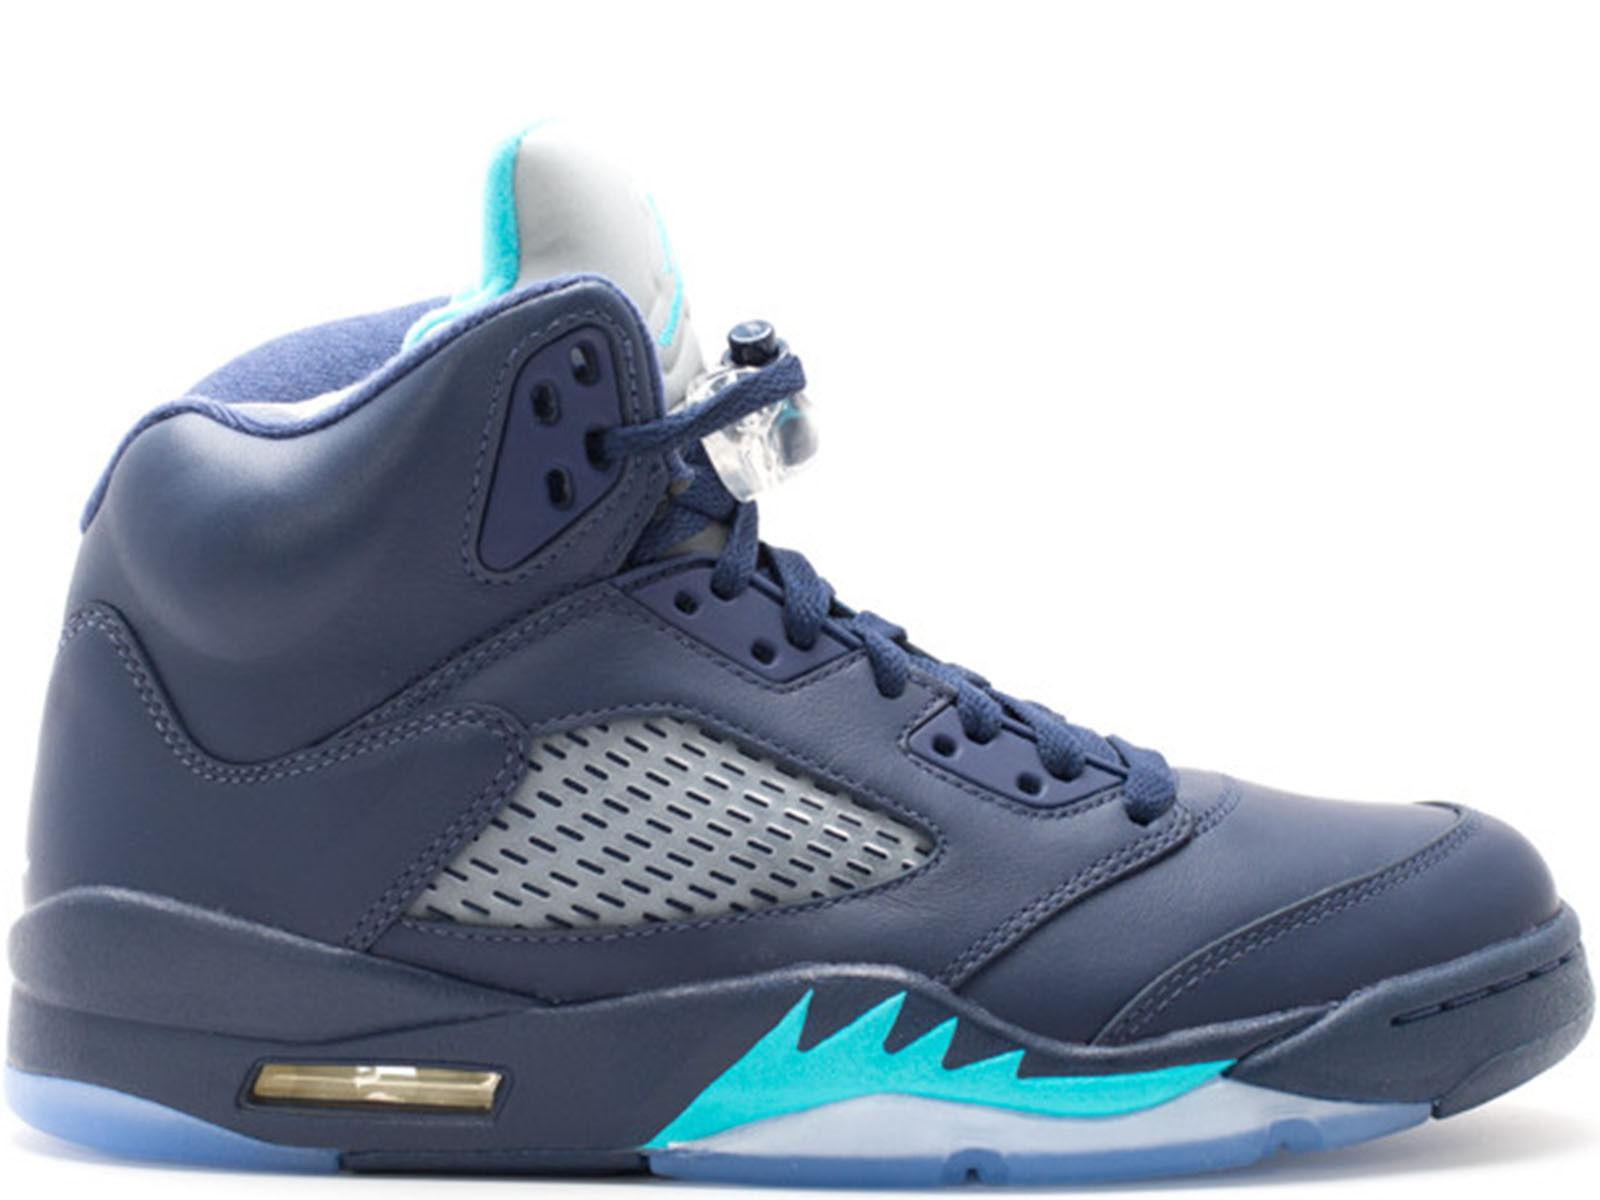 Men's Brand New Air Jordan 5 Retro  Hornets  Athletic Sneakers